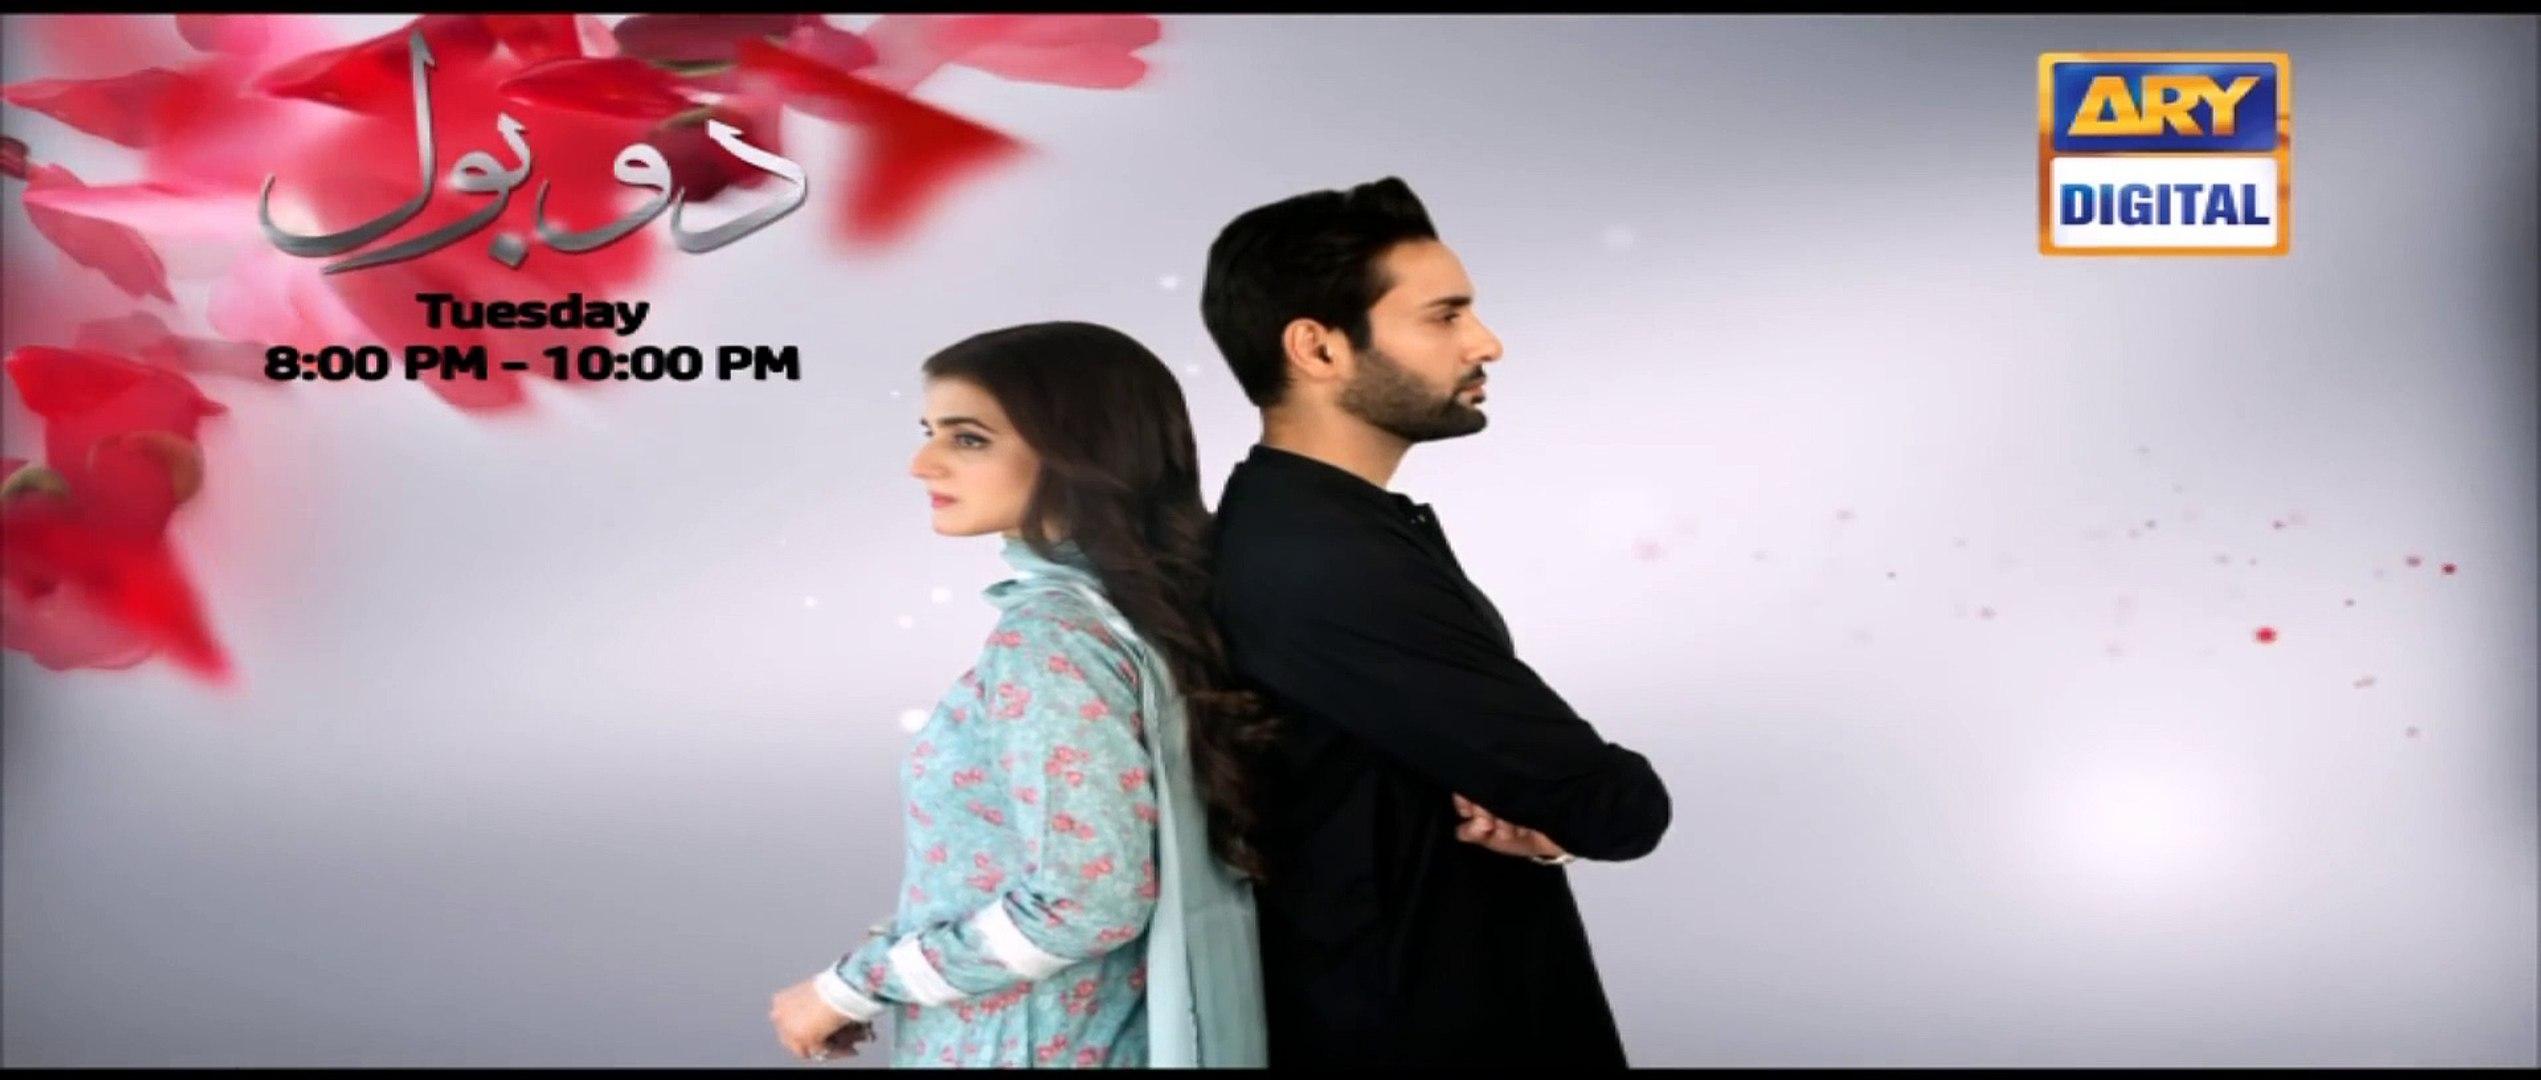 Ja Tujhe Maaf Kiya - Singer- Nabeel Shaukat & Aima Baig - Lyrical OST - ARY  Digital